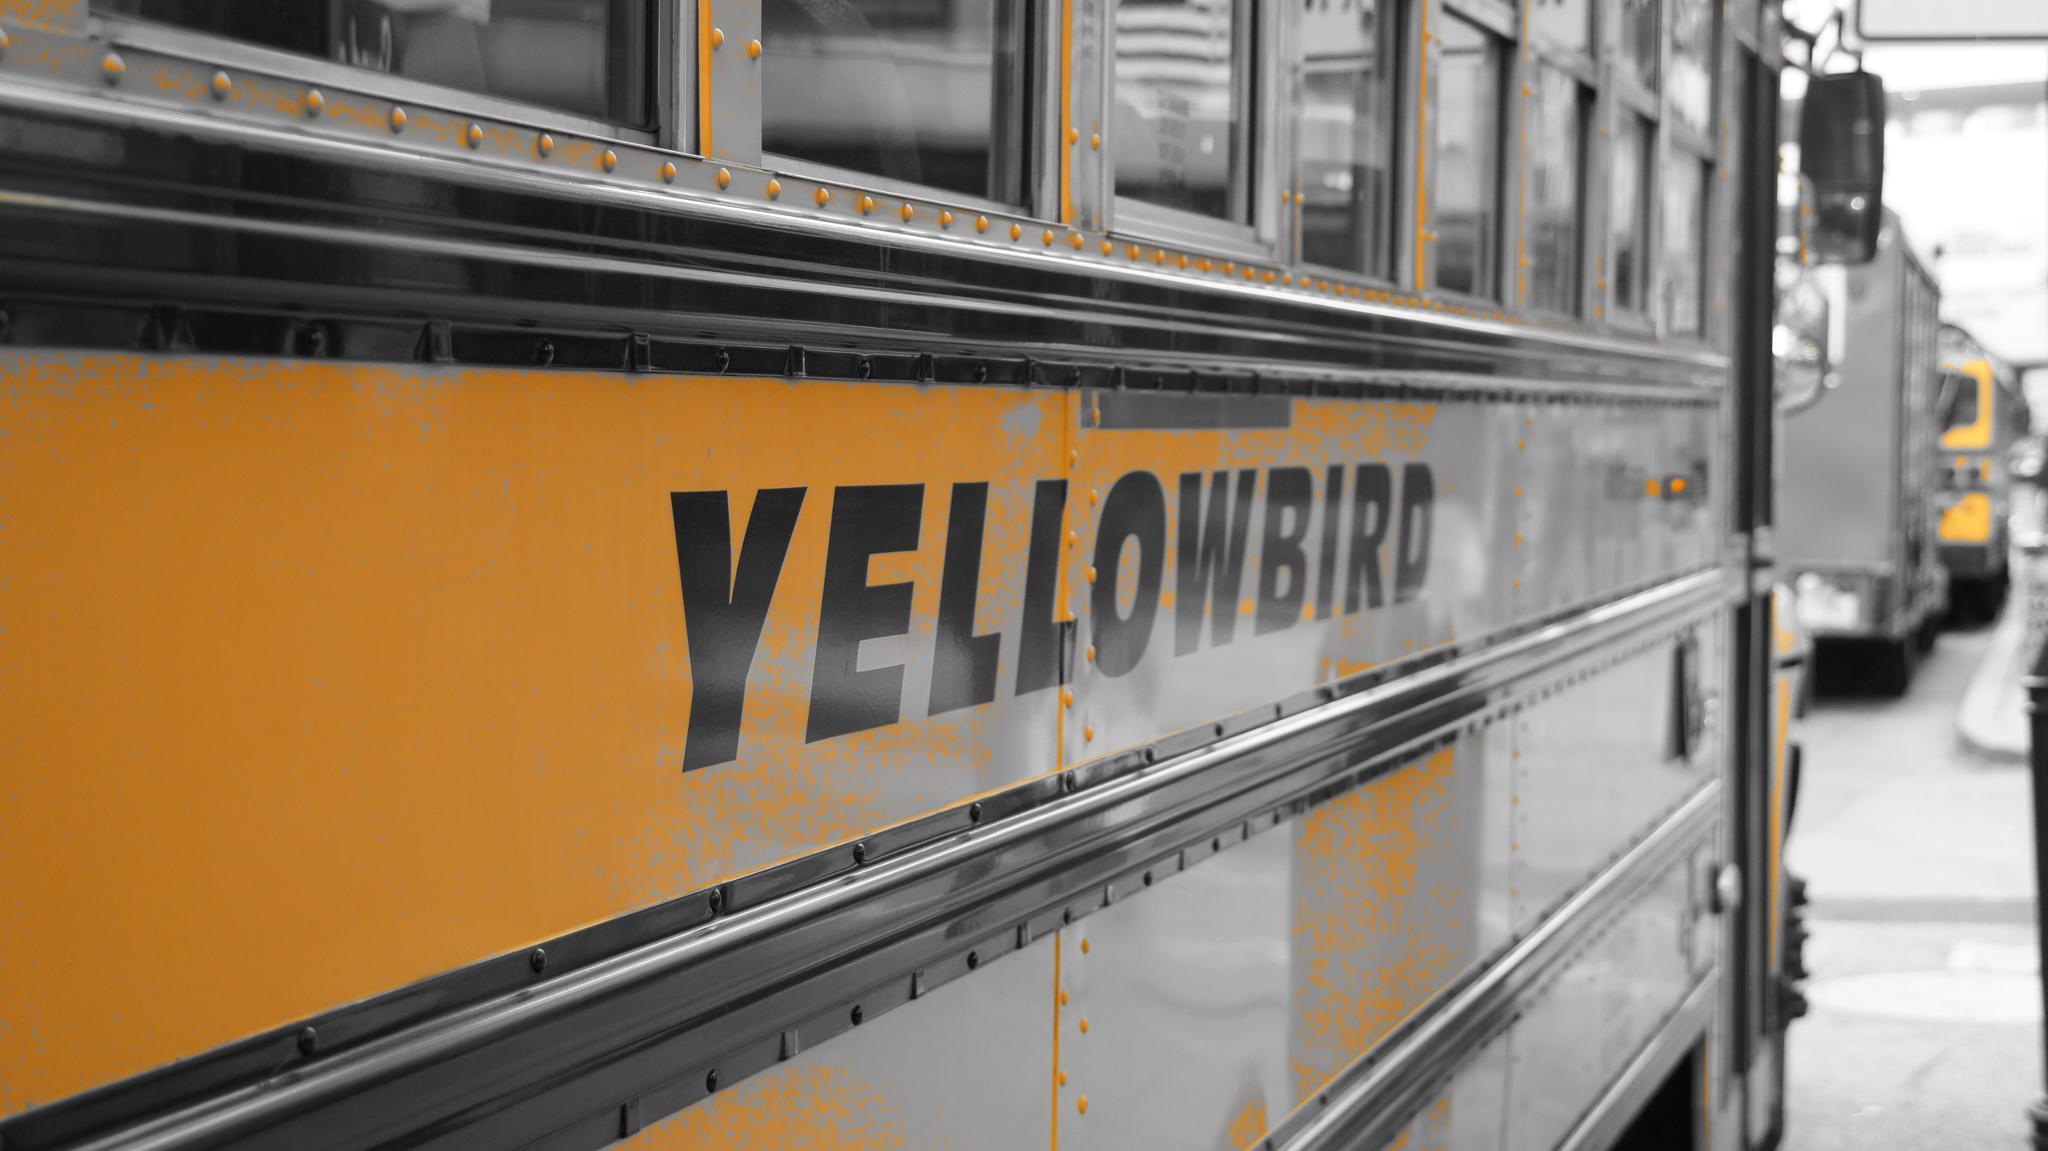 Yellowbird by ghislain